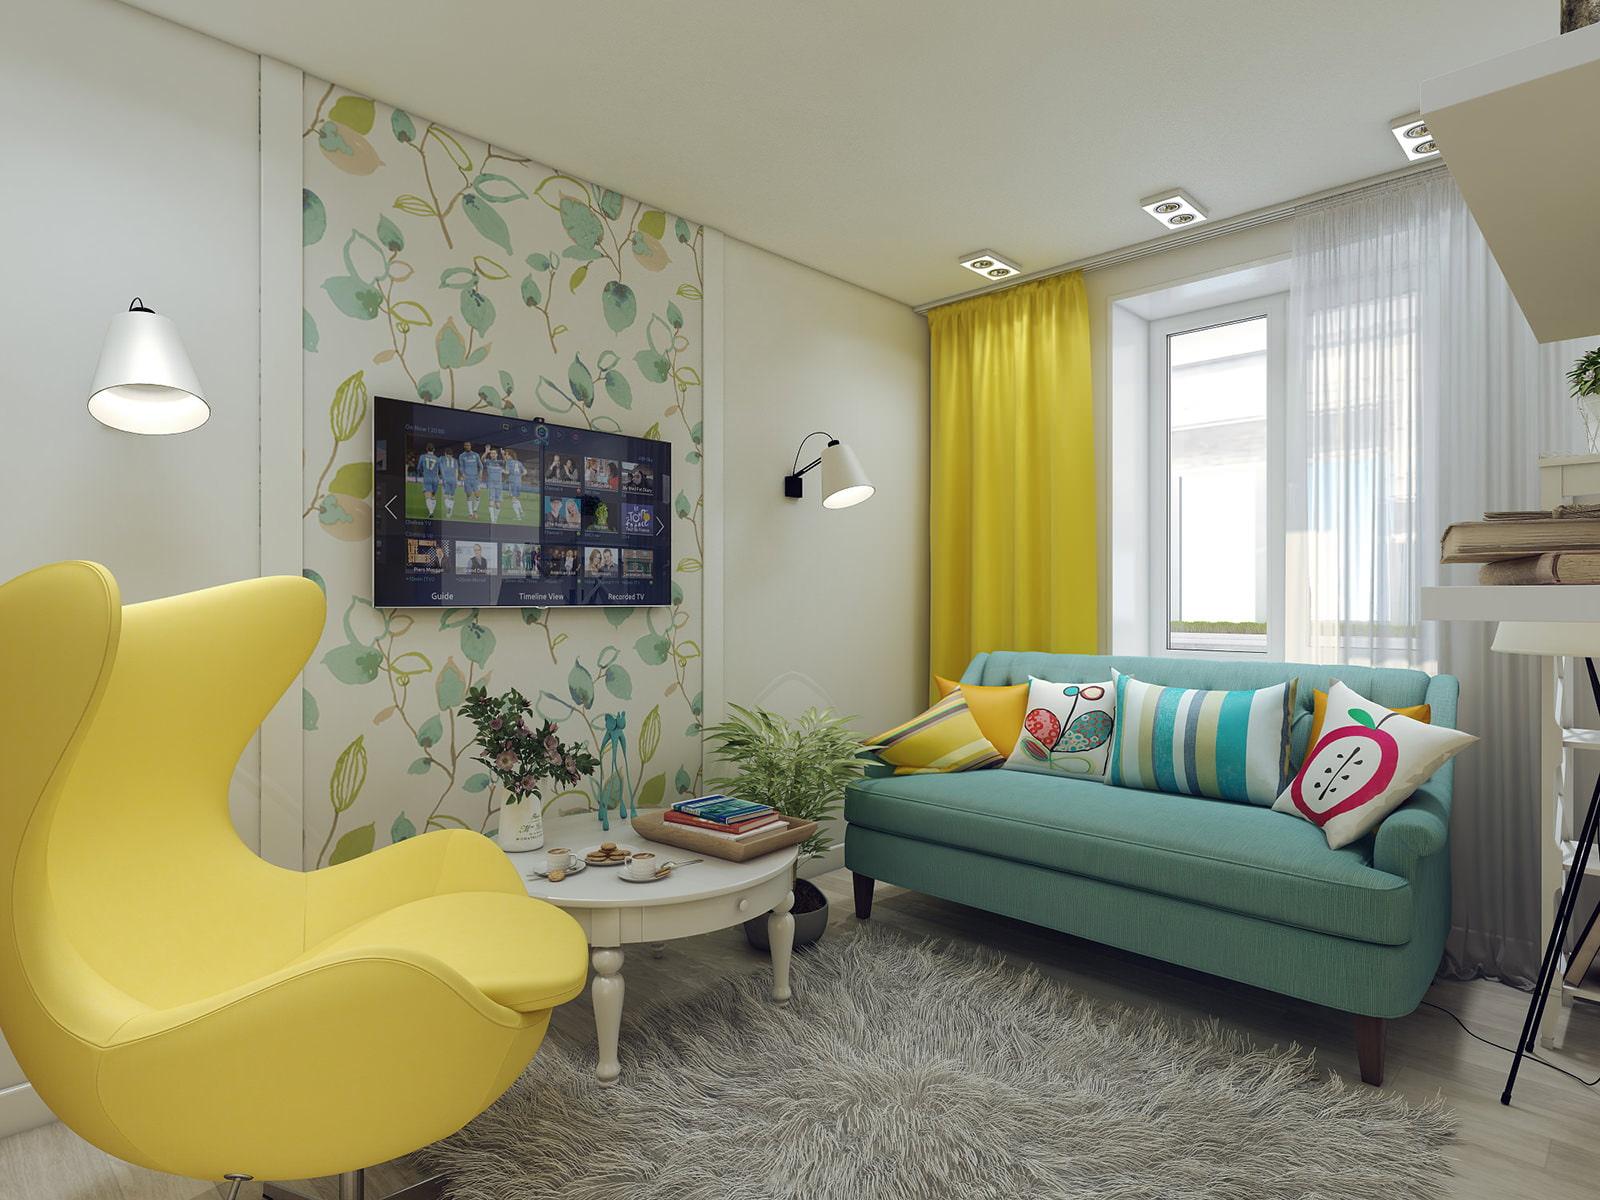 Дизайн проекты 3-х комнатных квартир фото 80 кв.м